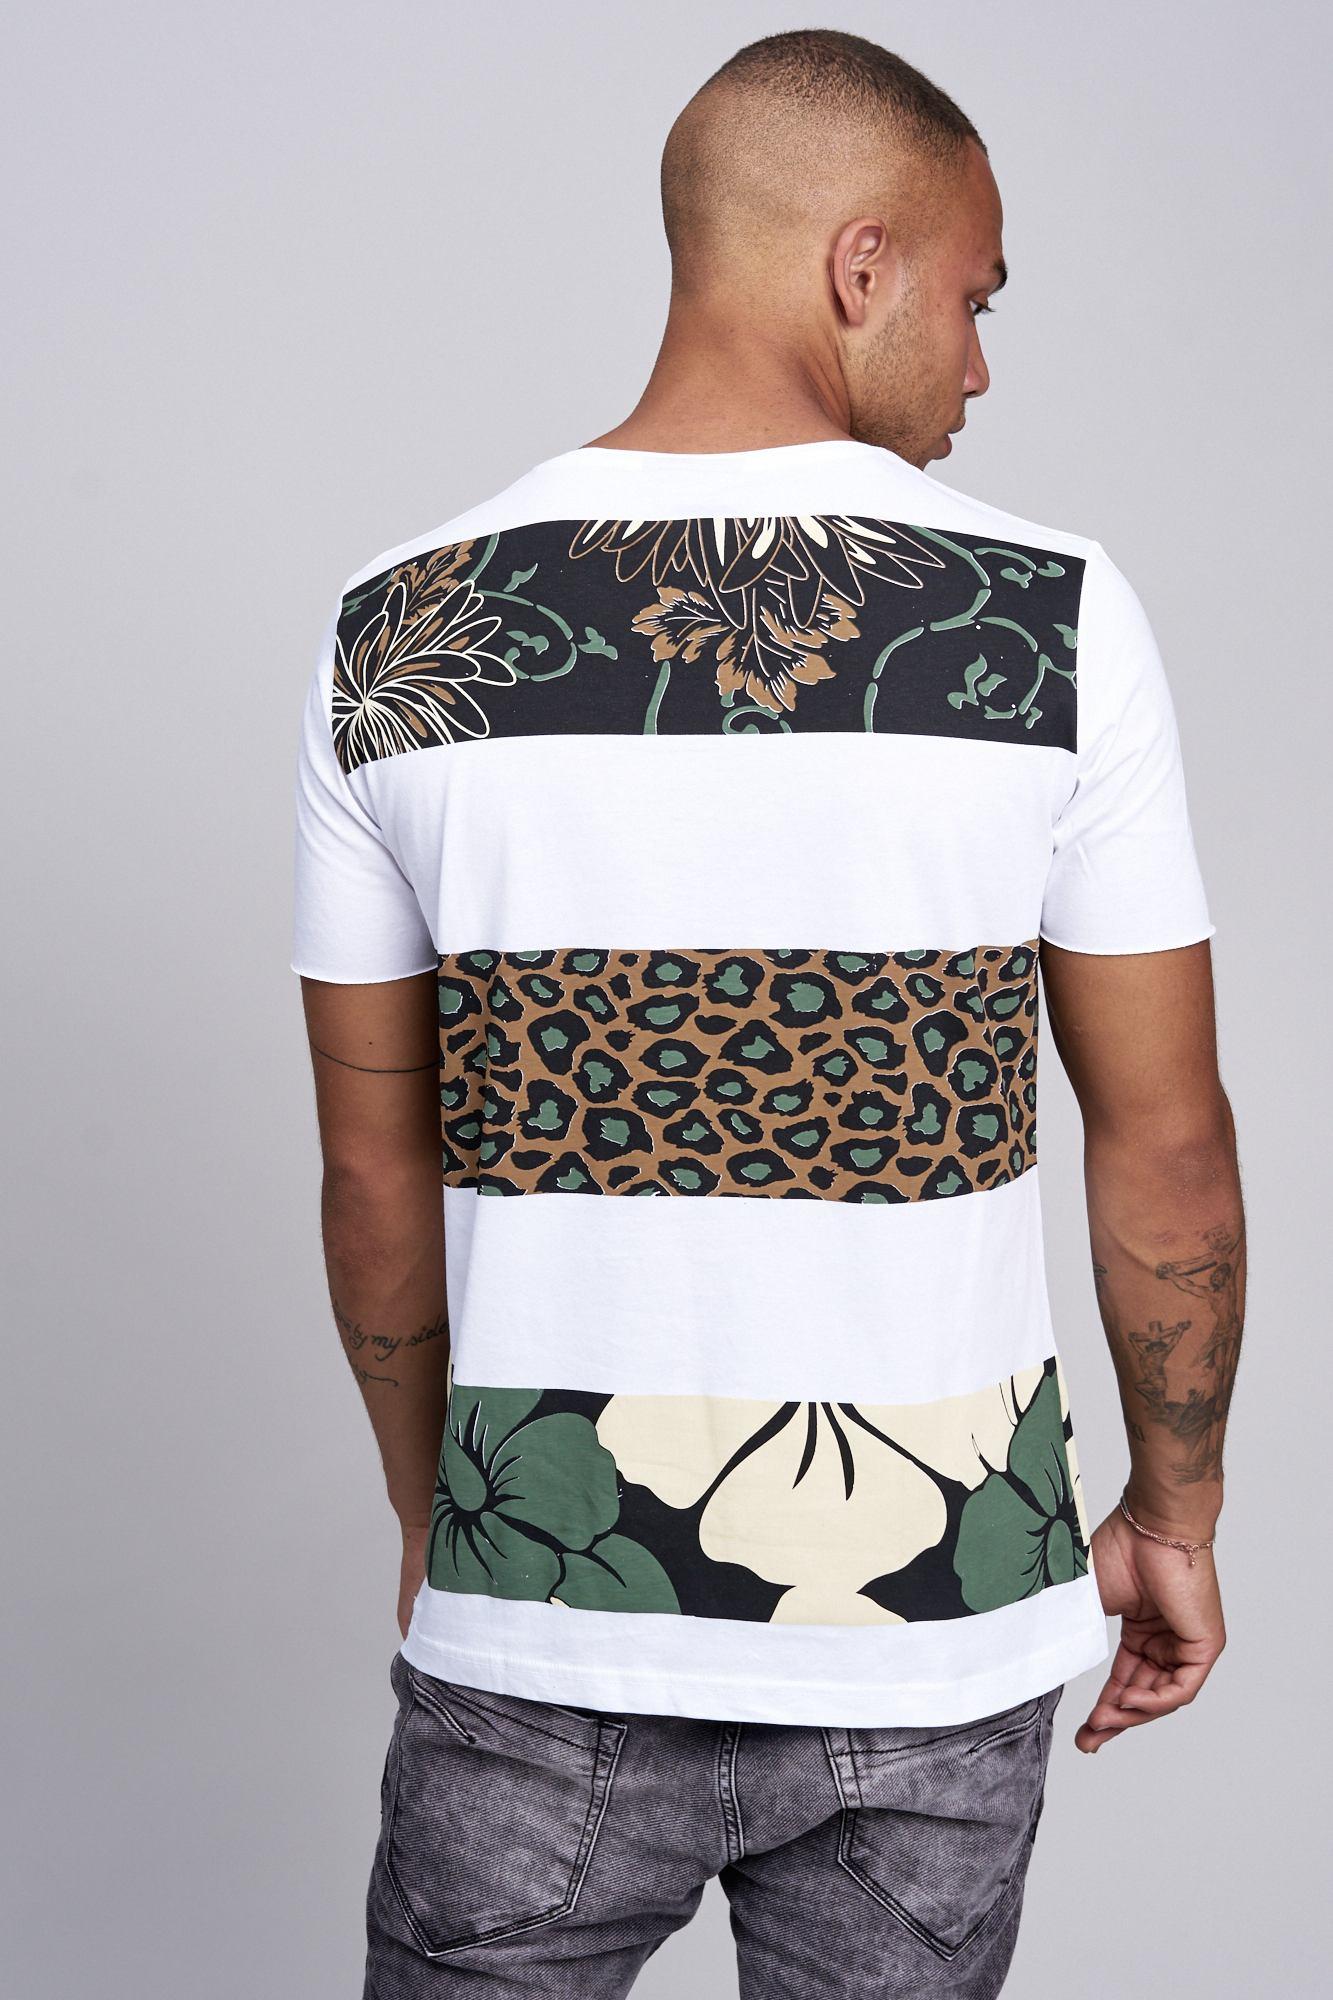 T-shirt-da-Uomo-Polo-Shirt-a-Maniche-Corte-printshirt-Polo-a-Maniche-Corte-17019-John-Kayna miniatura 28